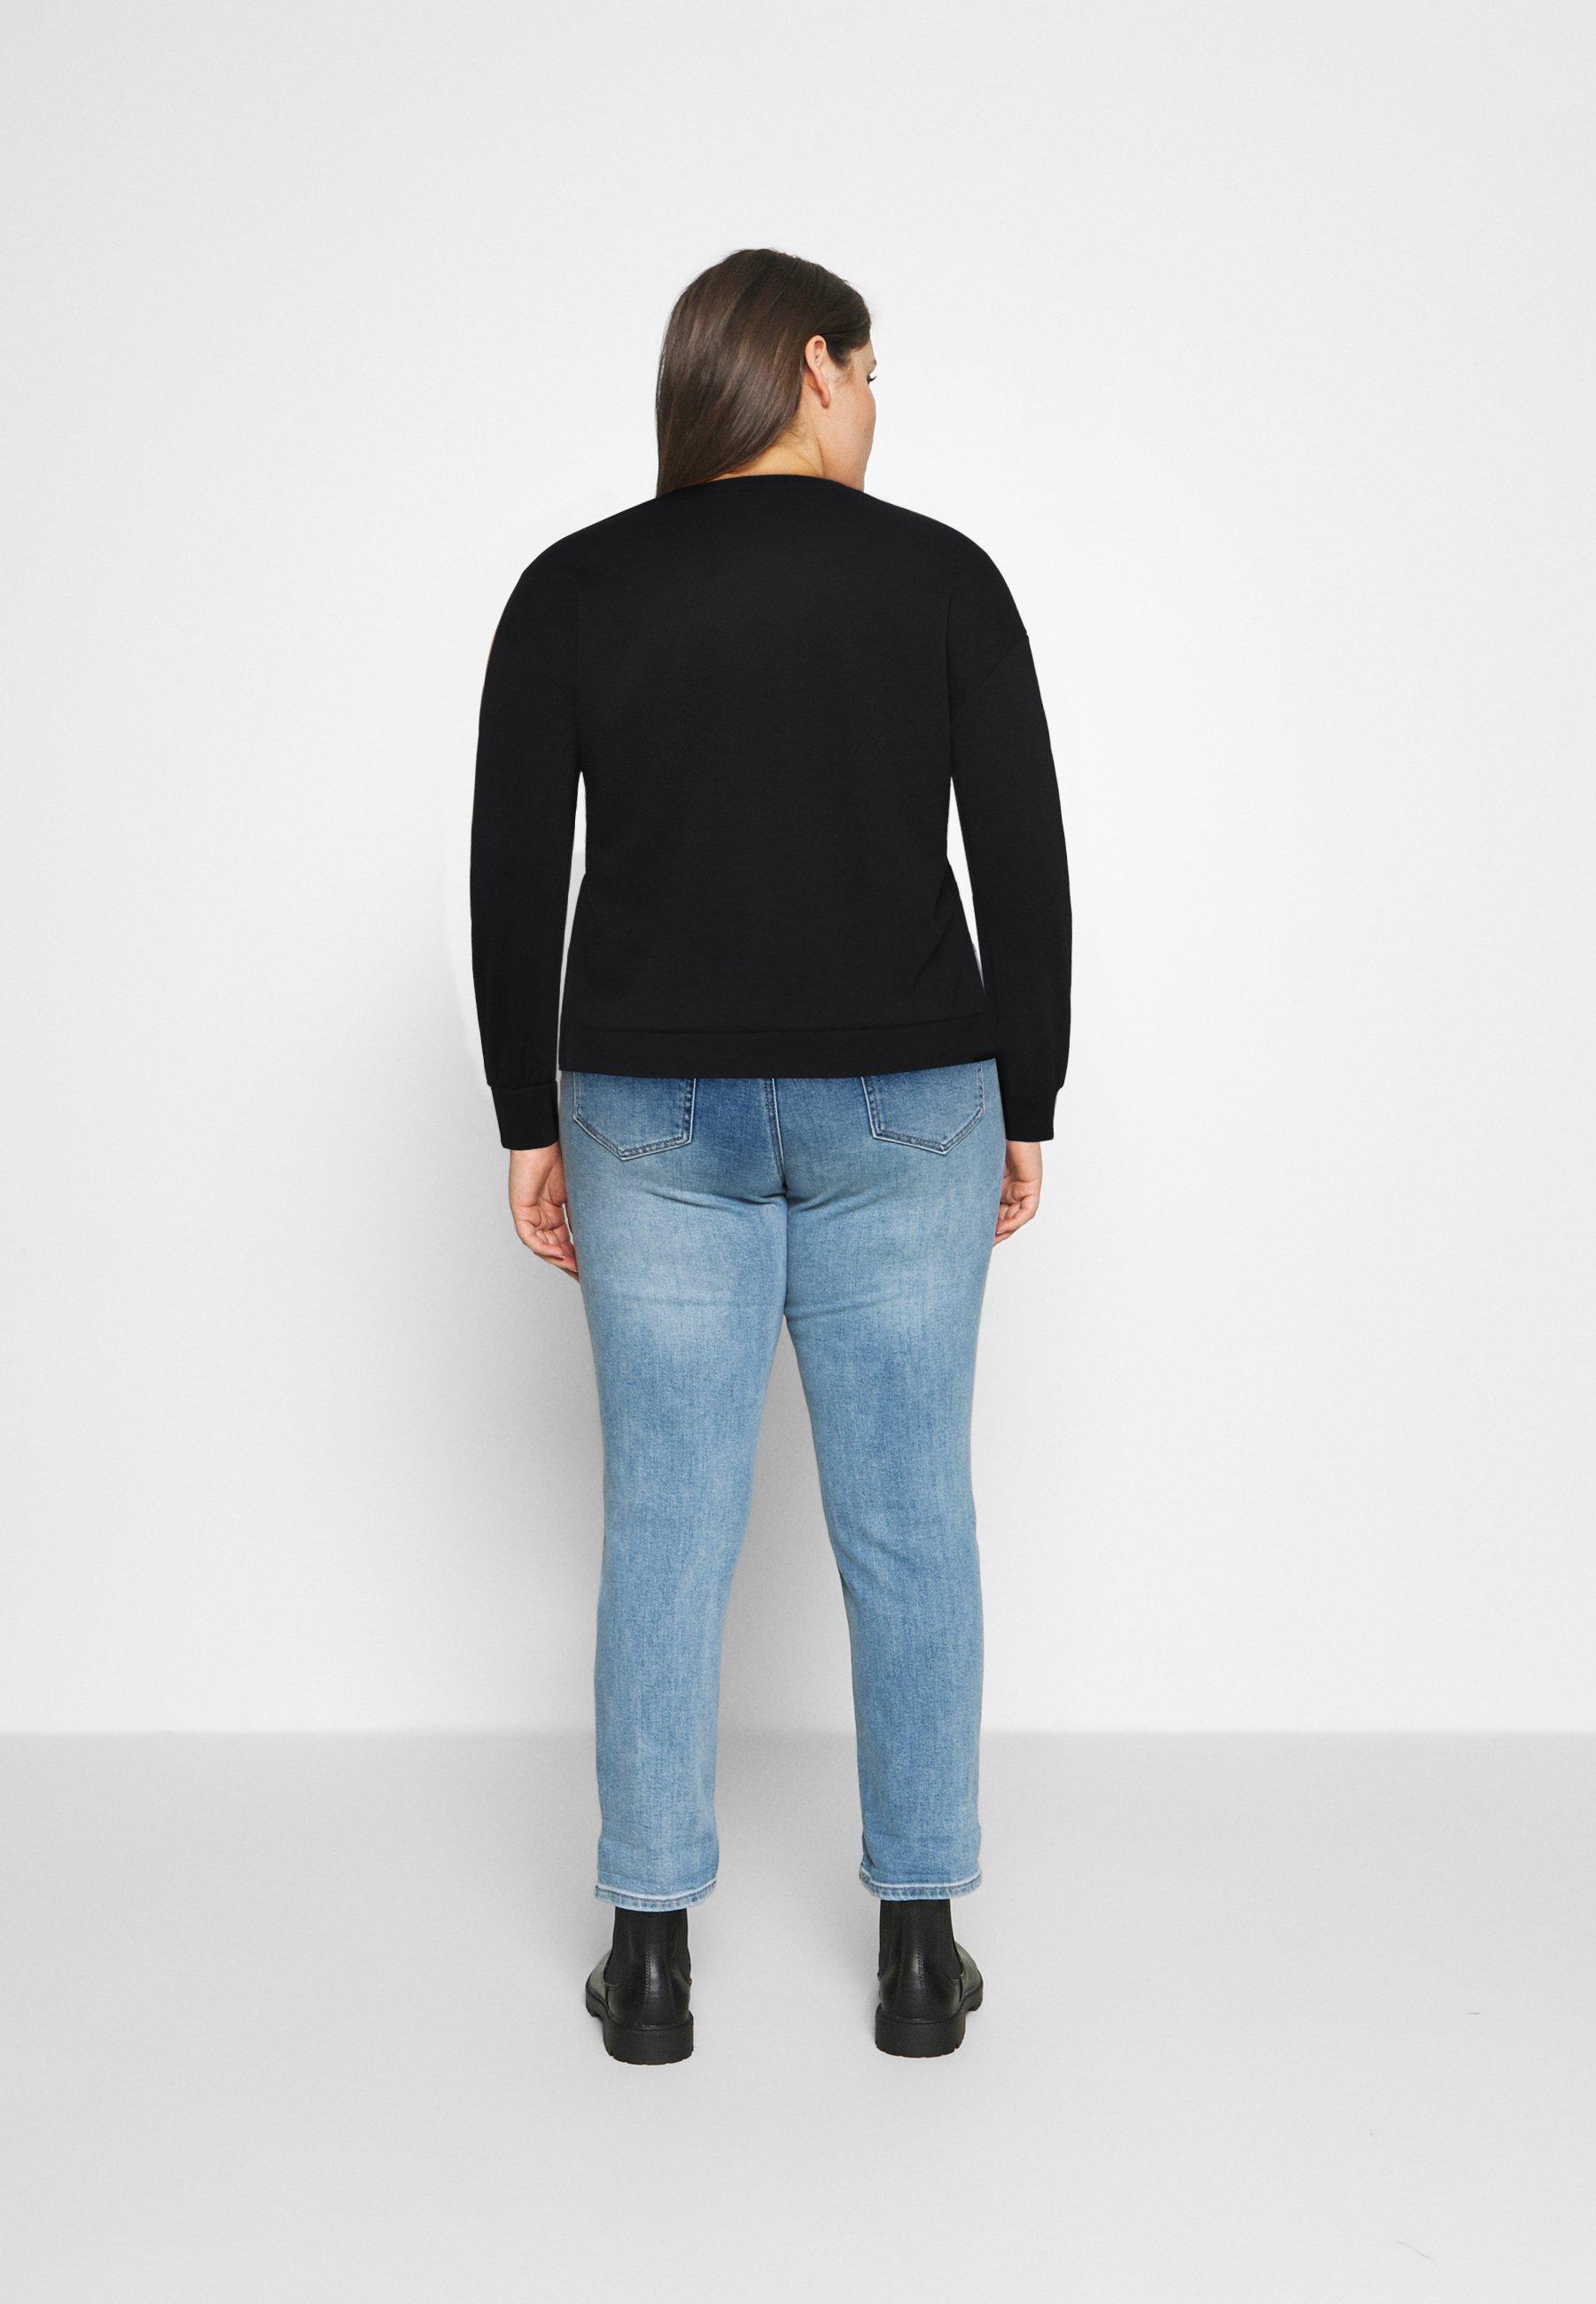 Women CARTHILDE ONECK  - Sweatshirt